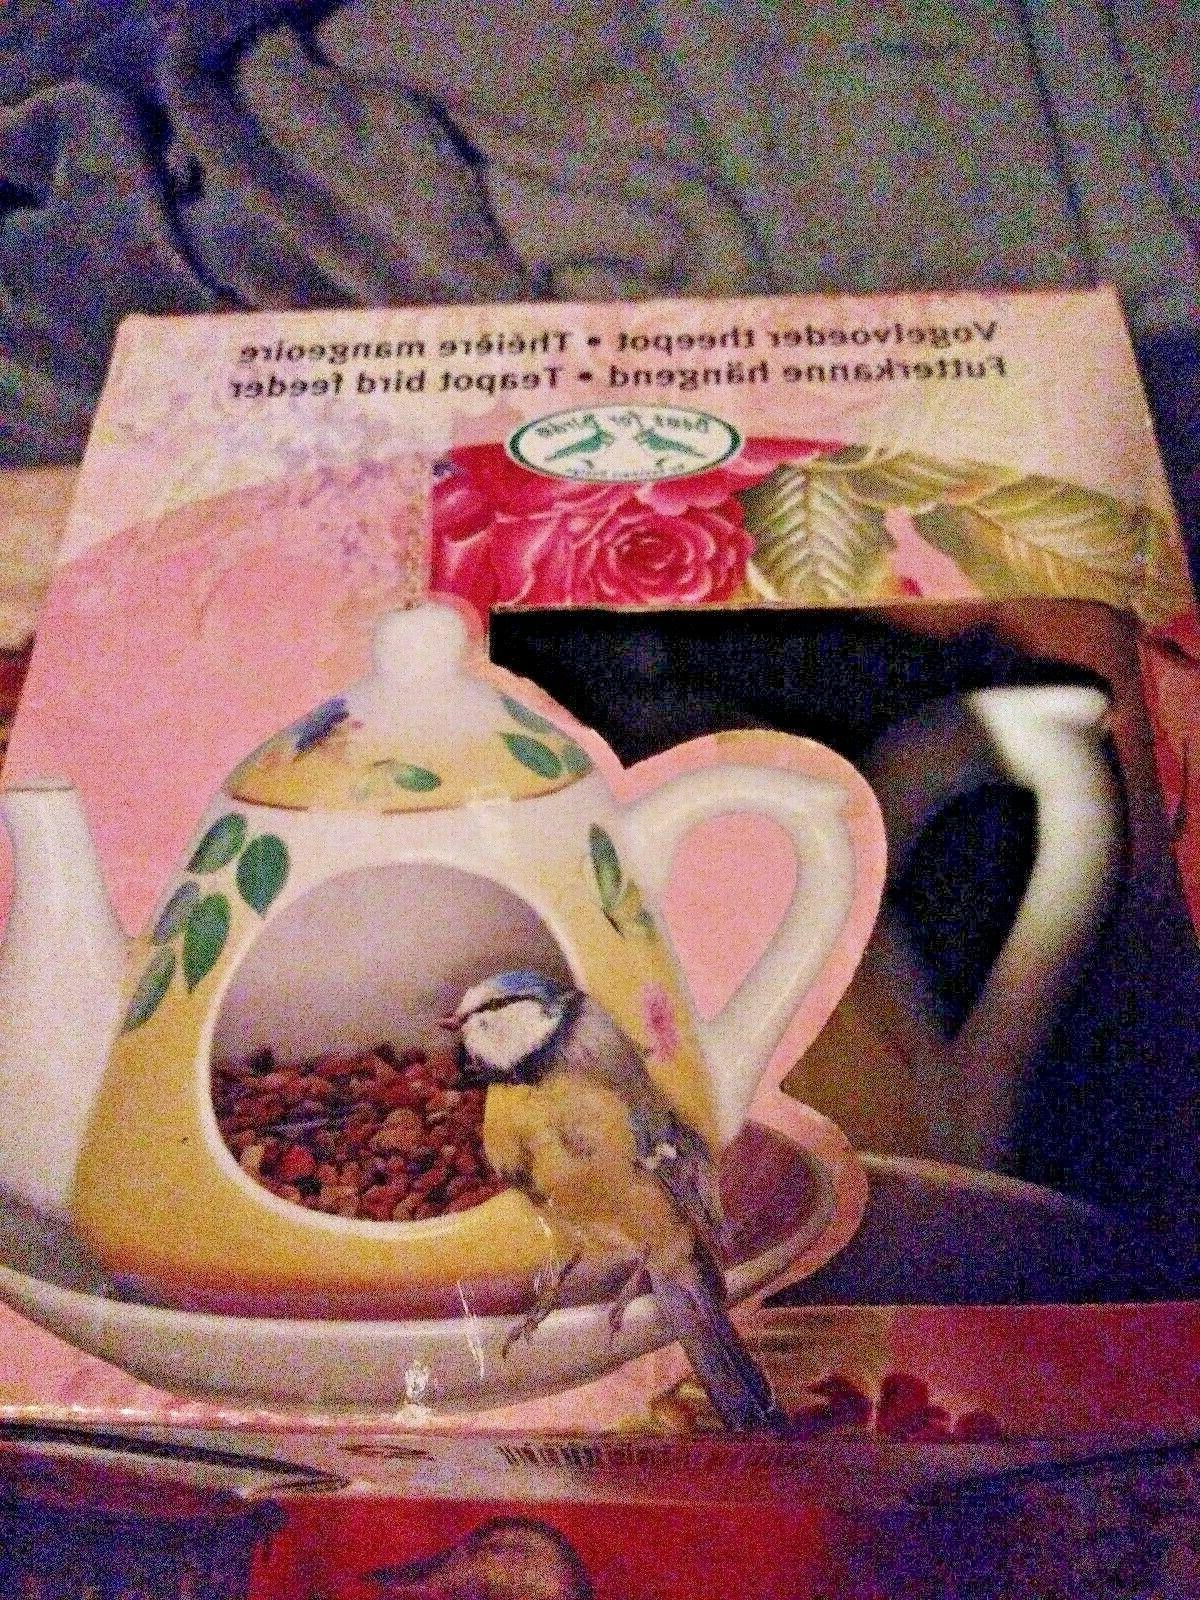 bird feeder hanging teapot with saucer bird